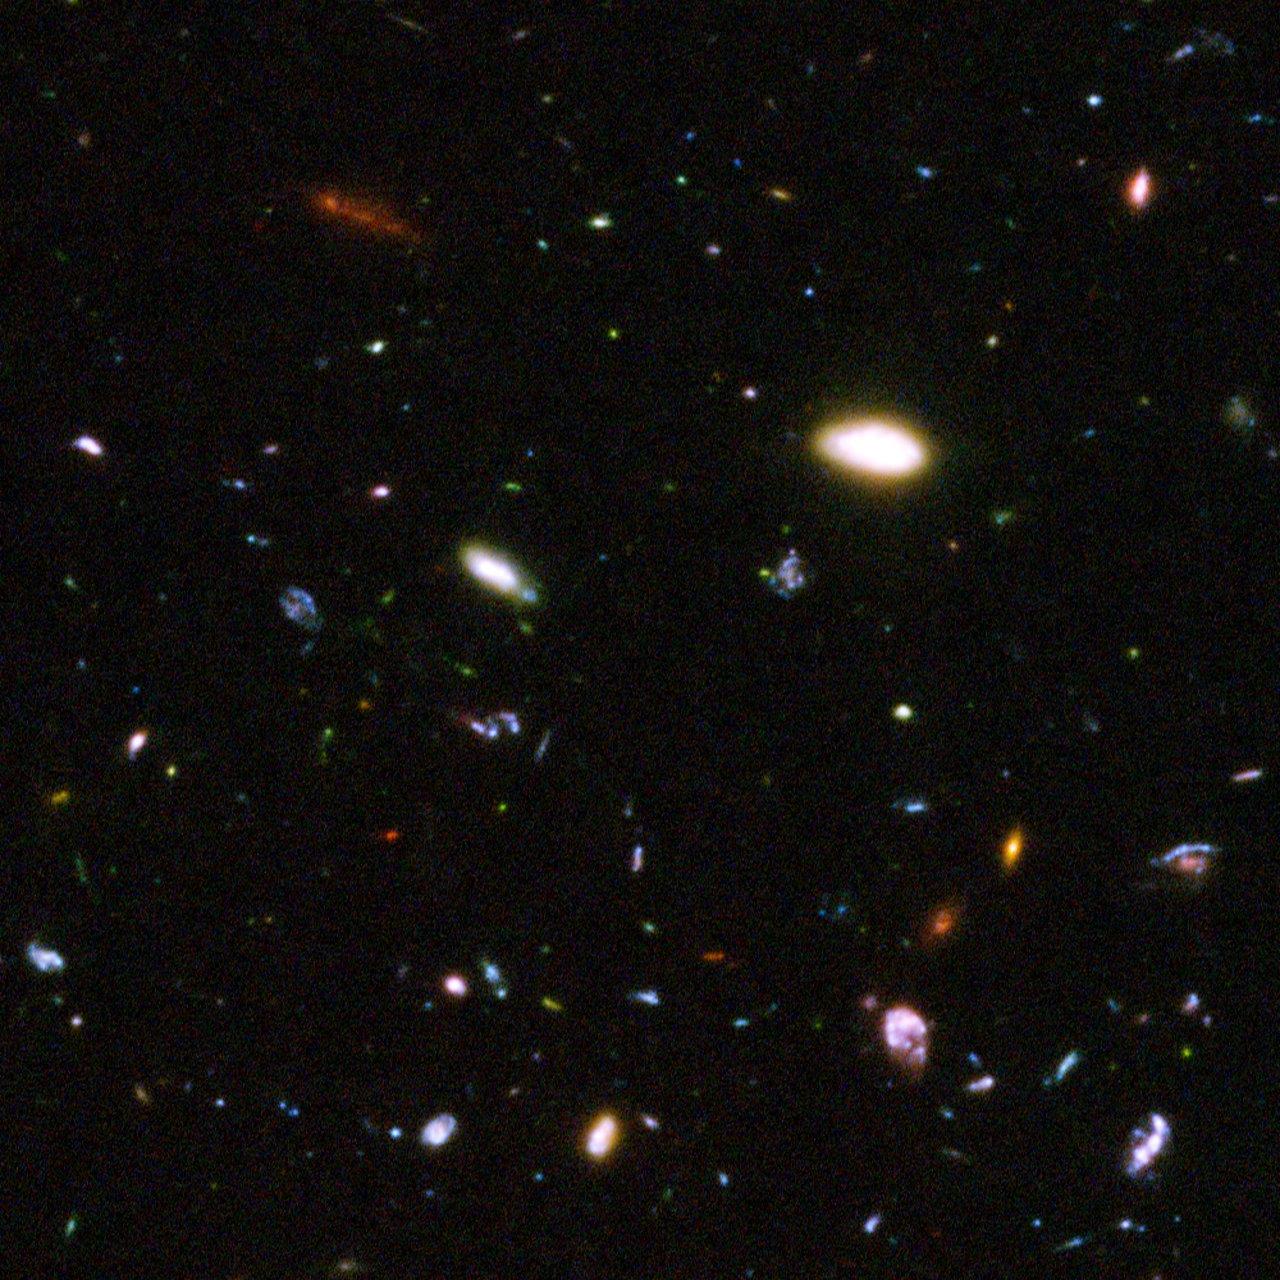 Hubble reveals galactic drama [image 4]